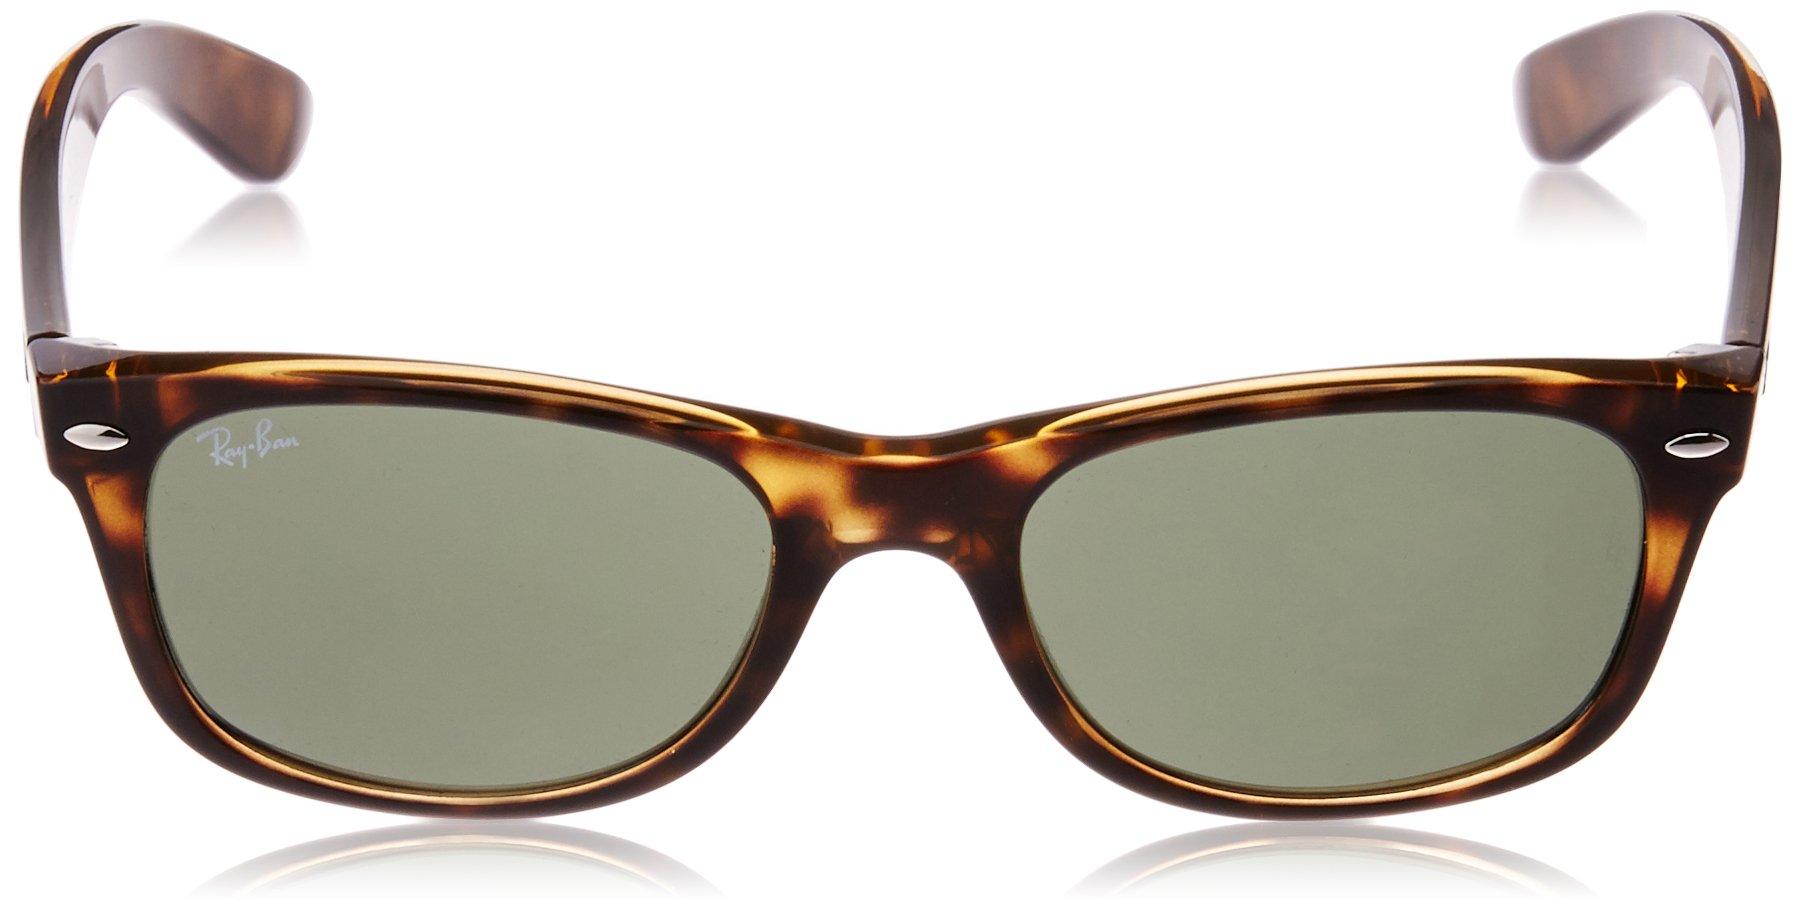 d07ae5873c7 Ray-Ban RB2132 New Wayfarer Sunglasses Unisex